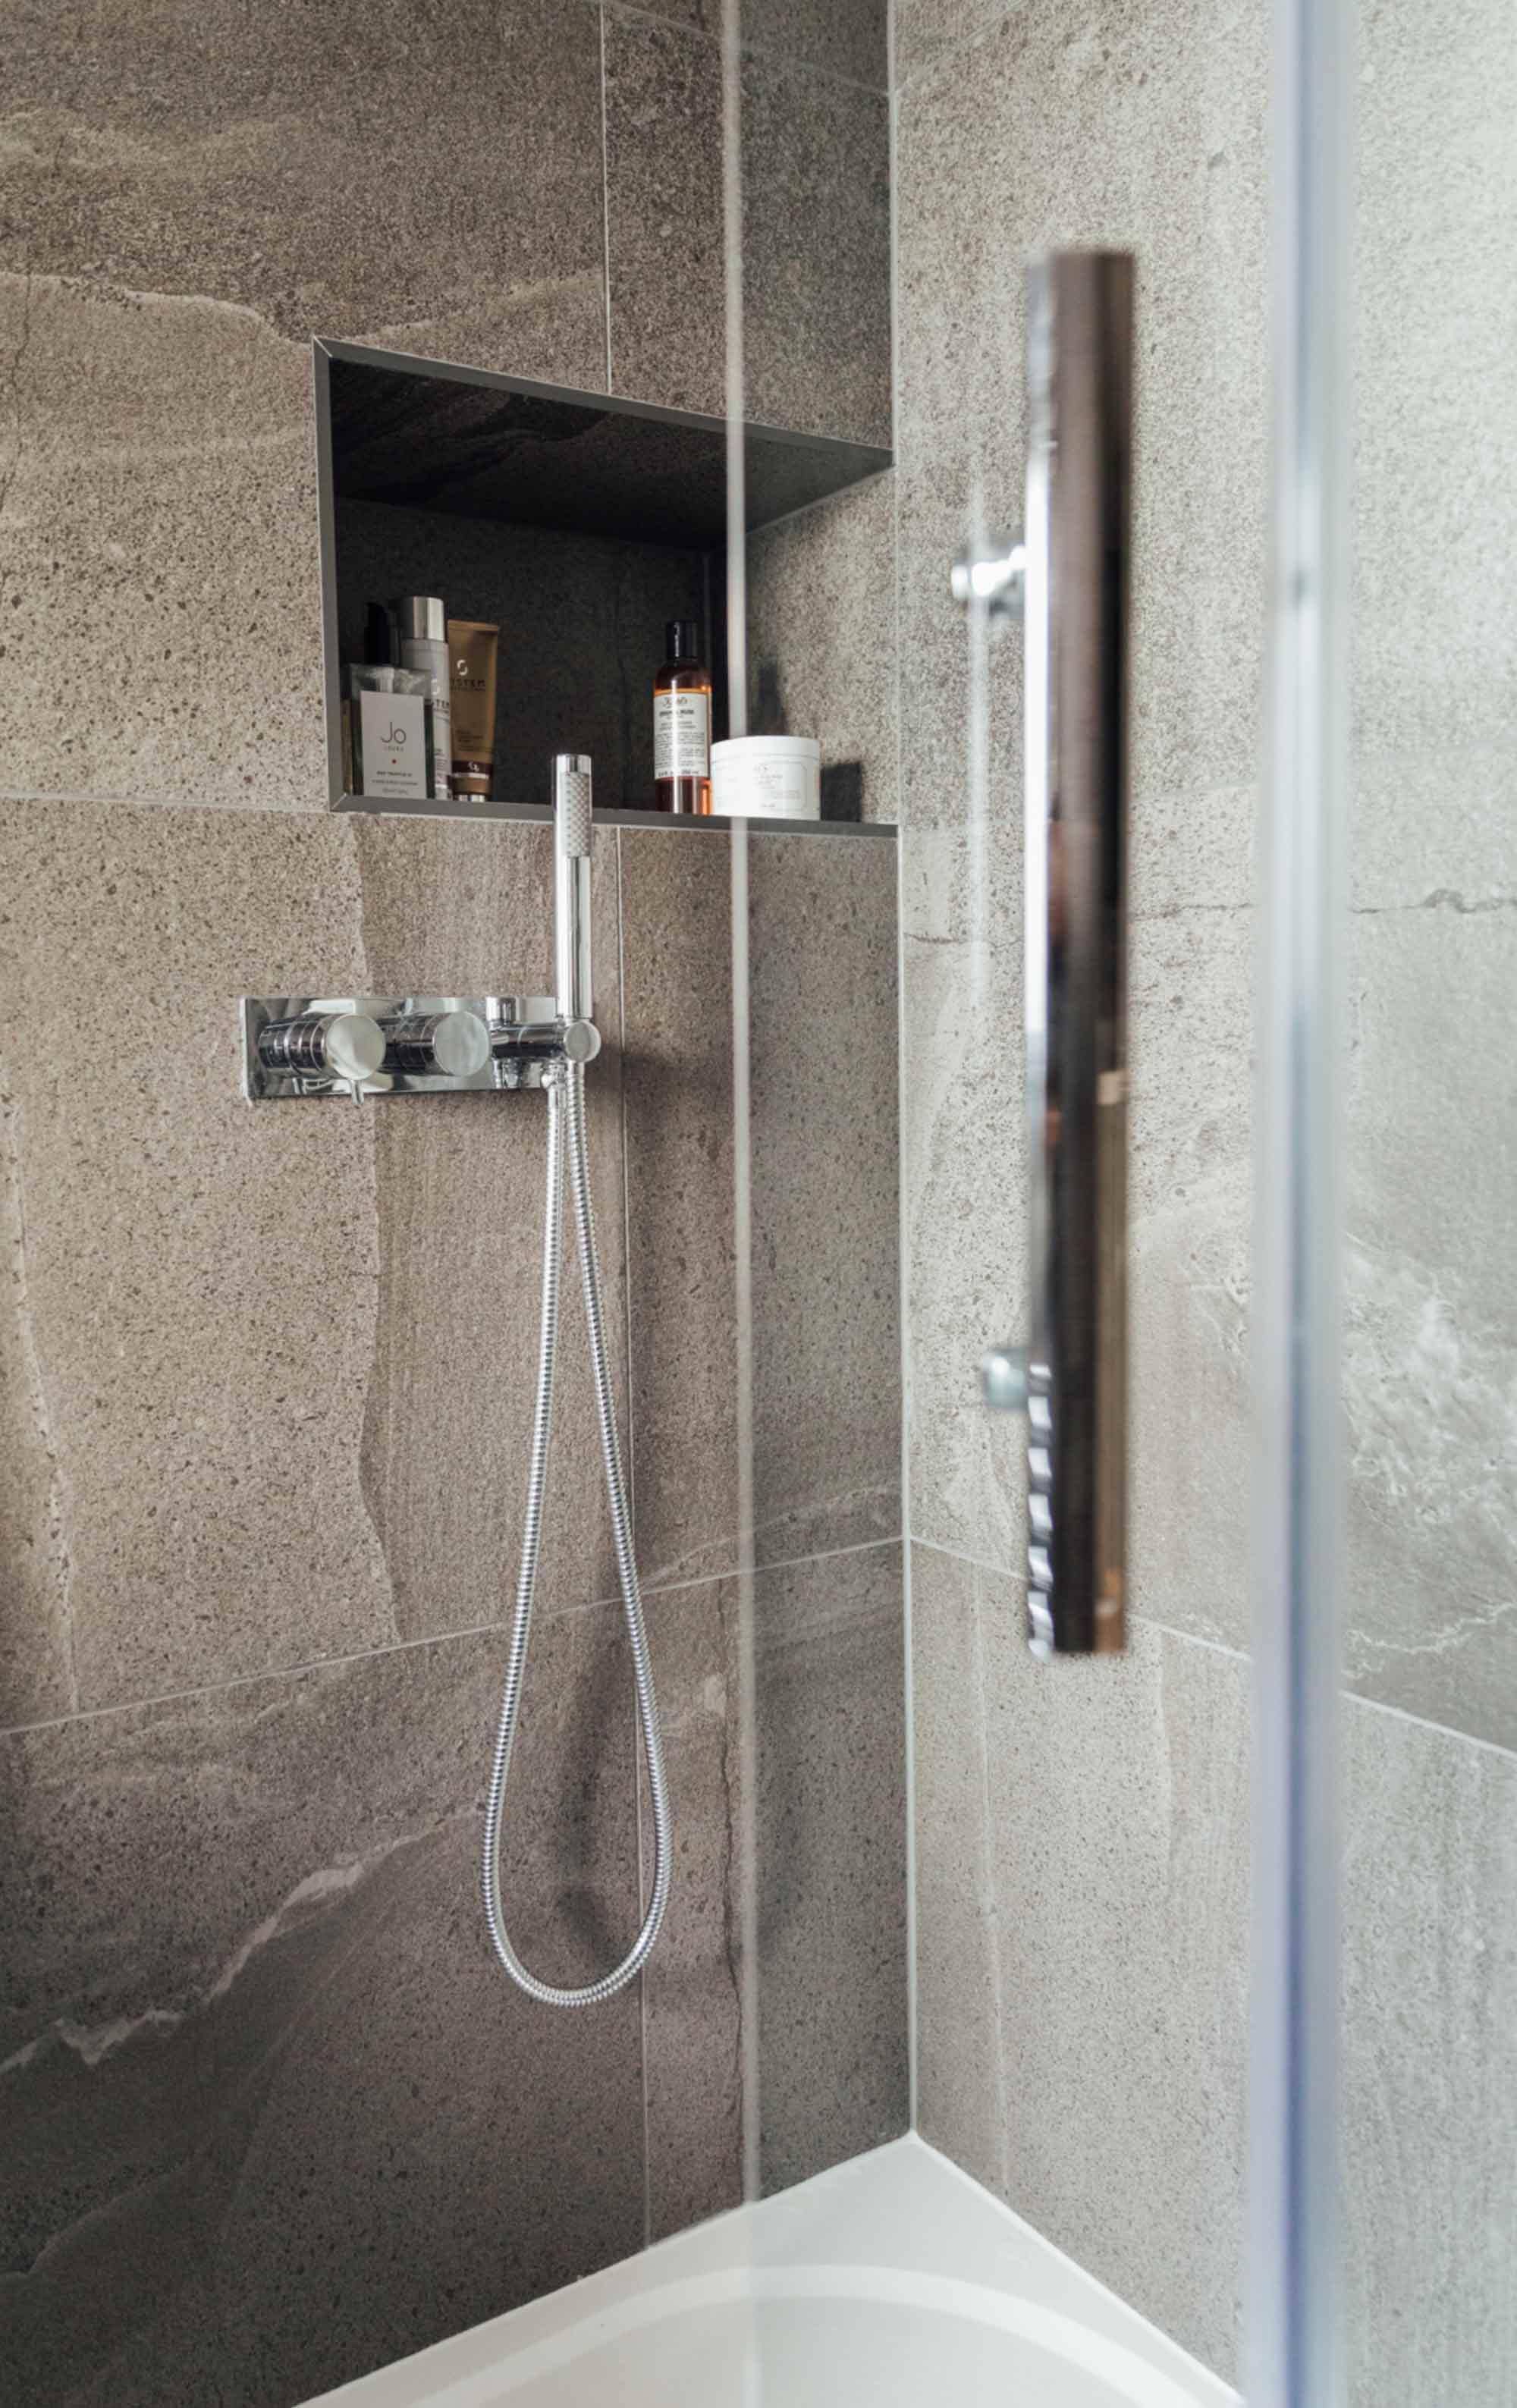 4a dark-grey-tiled-shower-with-recess-shelf-for-storage.jpg